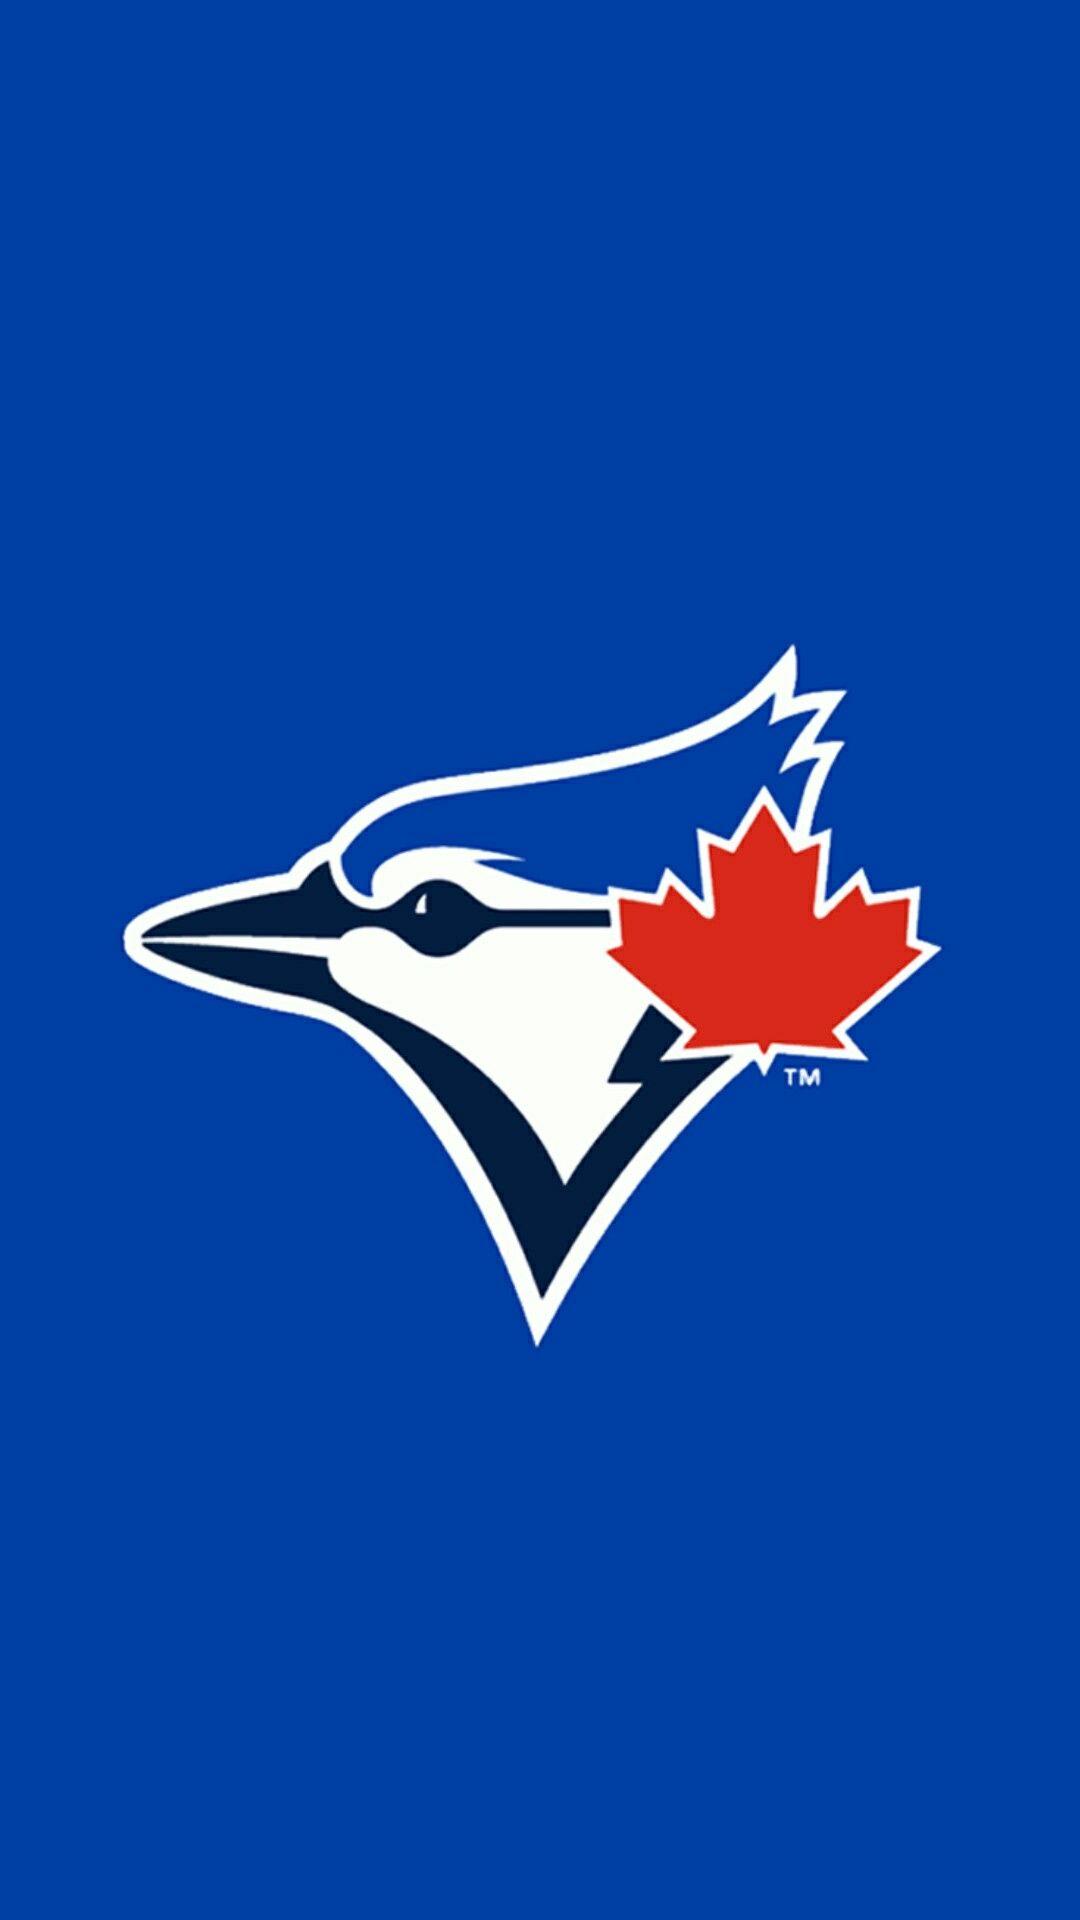 Toronto Blue Jays Toronto Blue Jays Logo Blue Jays Baseball Toronto Blue Jays